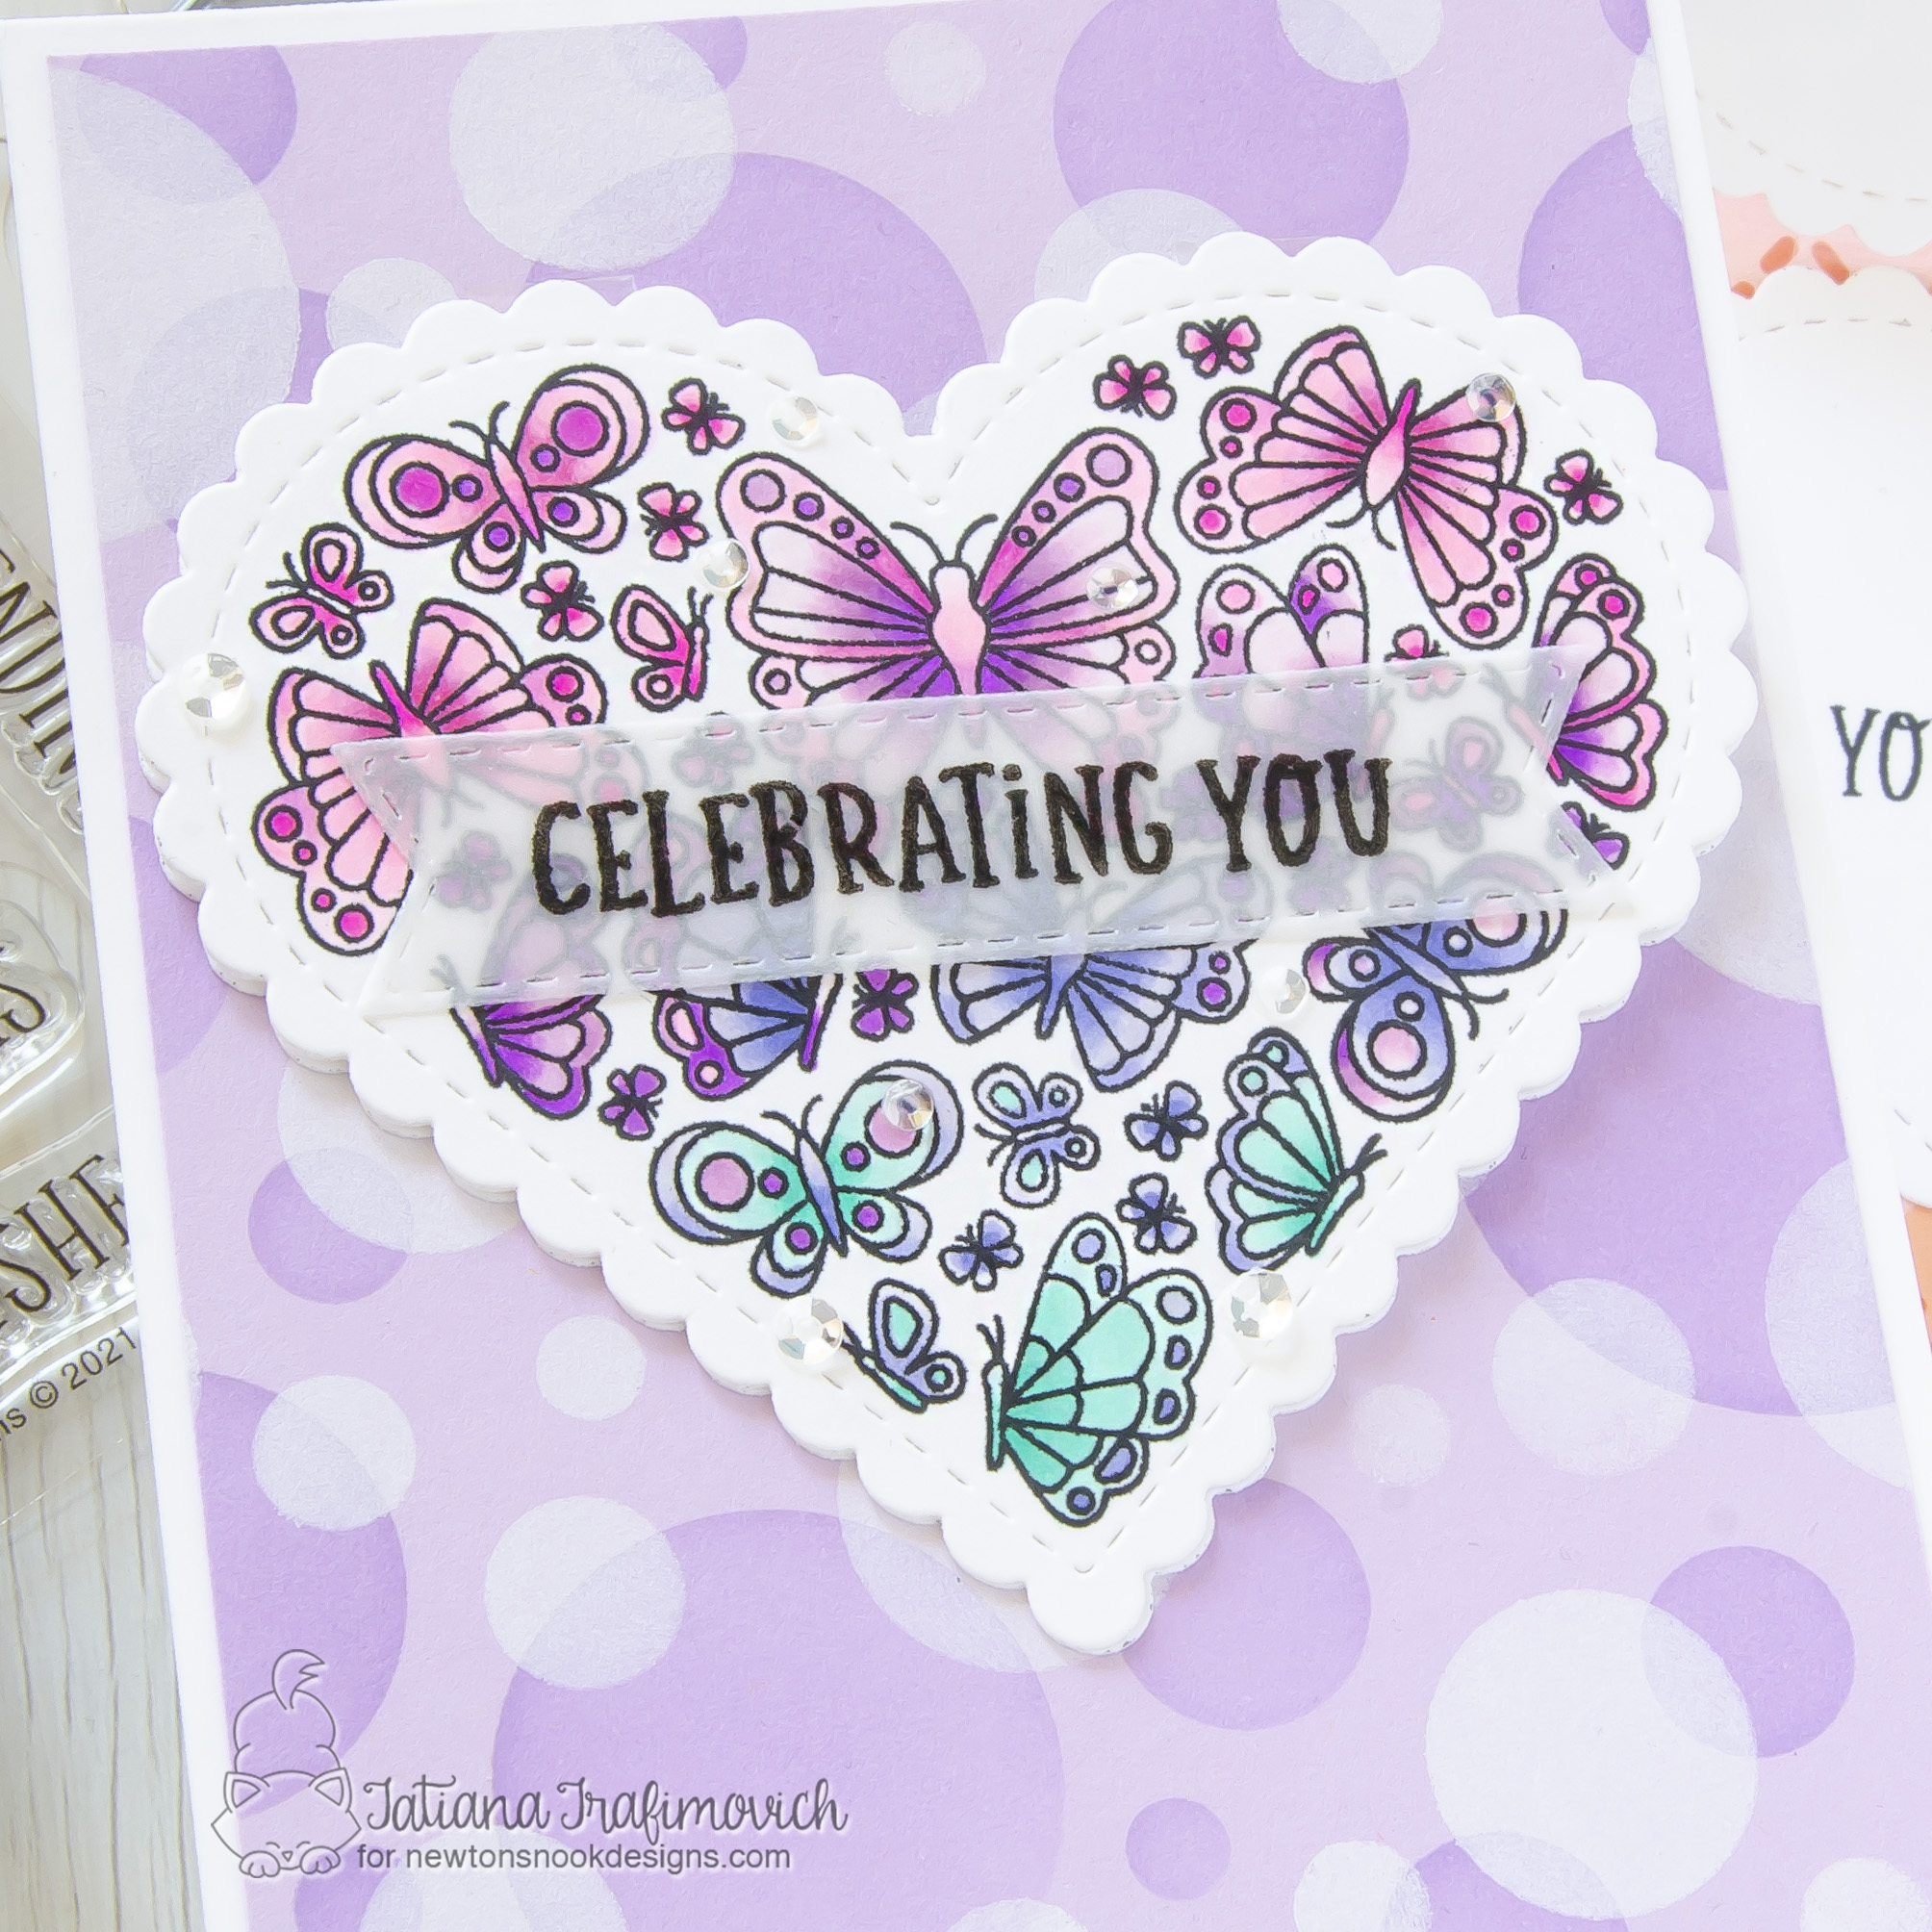 Celebrating You #handmade card by Tatiana Trafimovich #tatianacraftandart - Heartfelt Butterflies stamp set by Newton's Nook Designs #newtonsnook